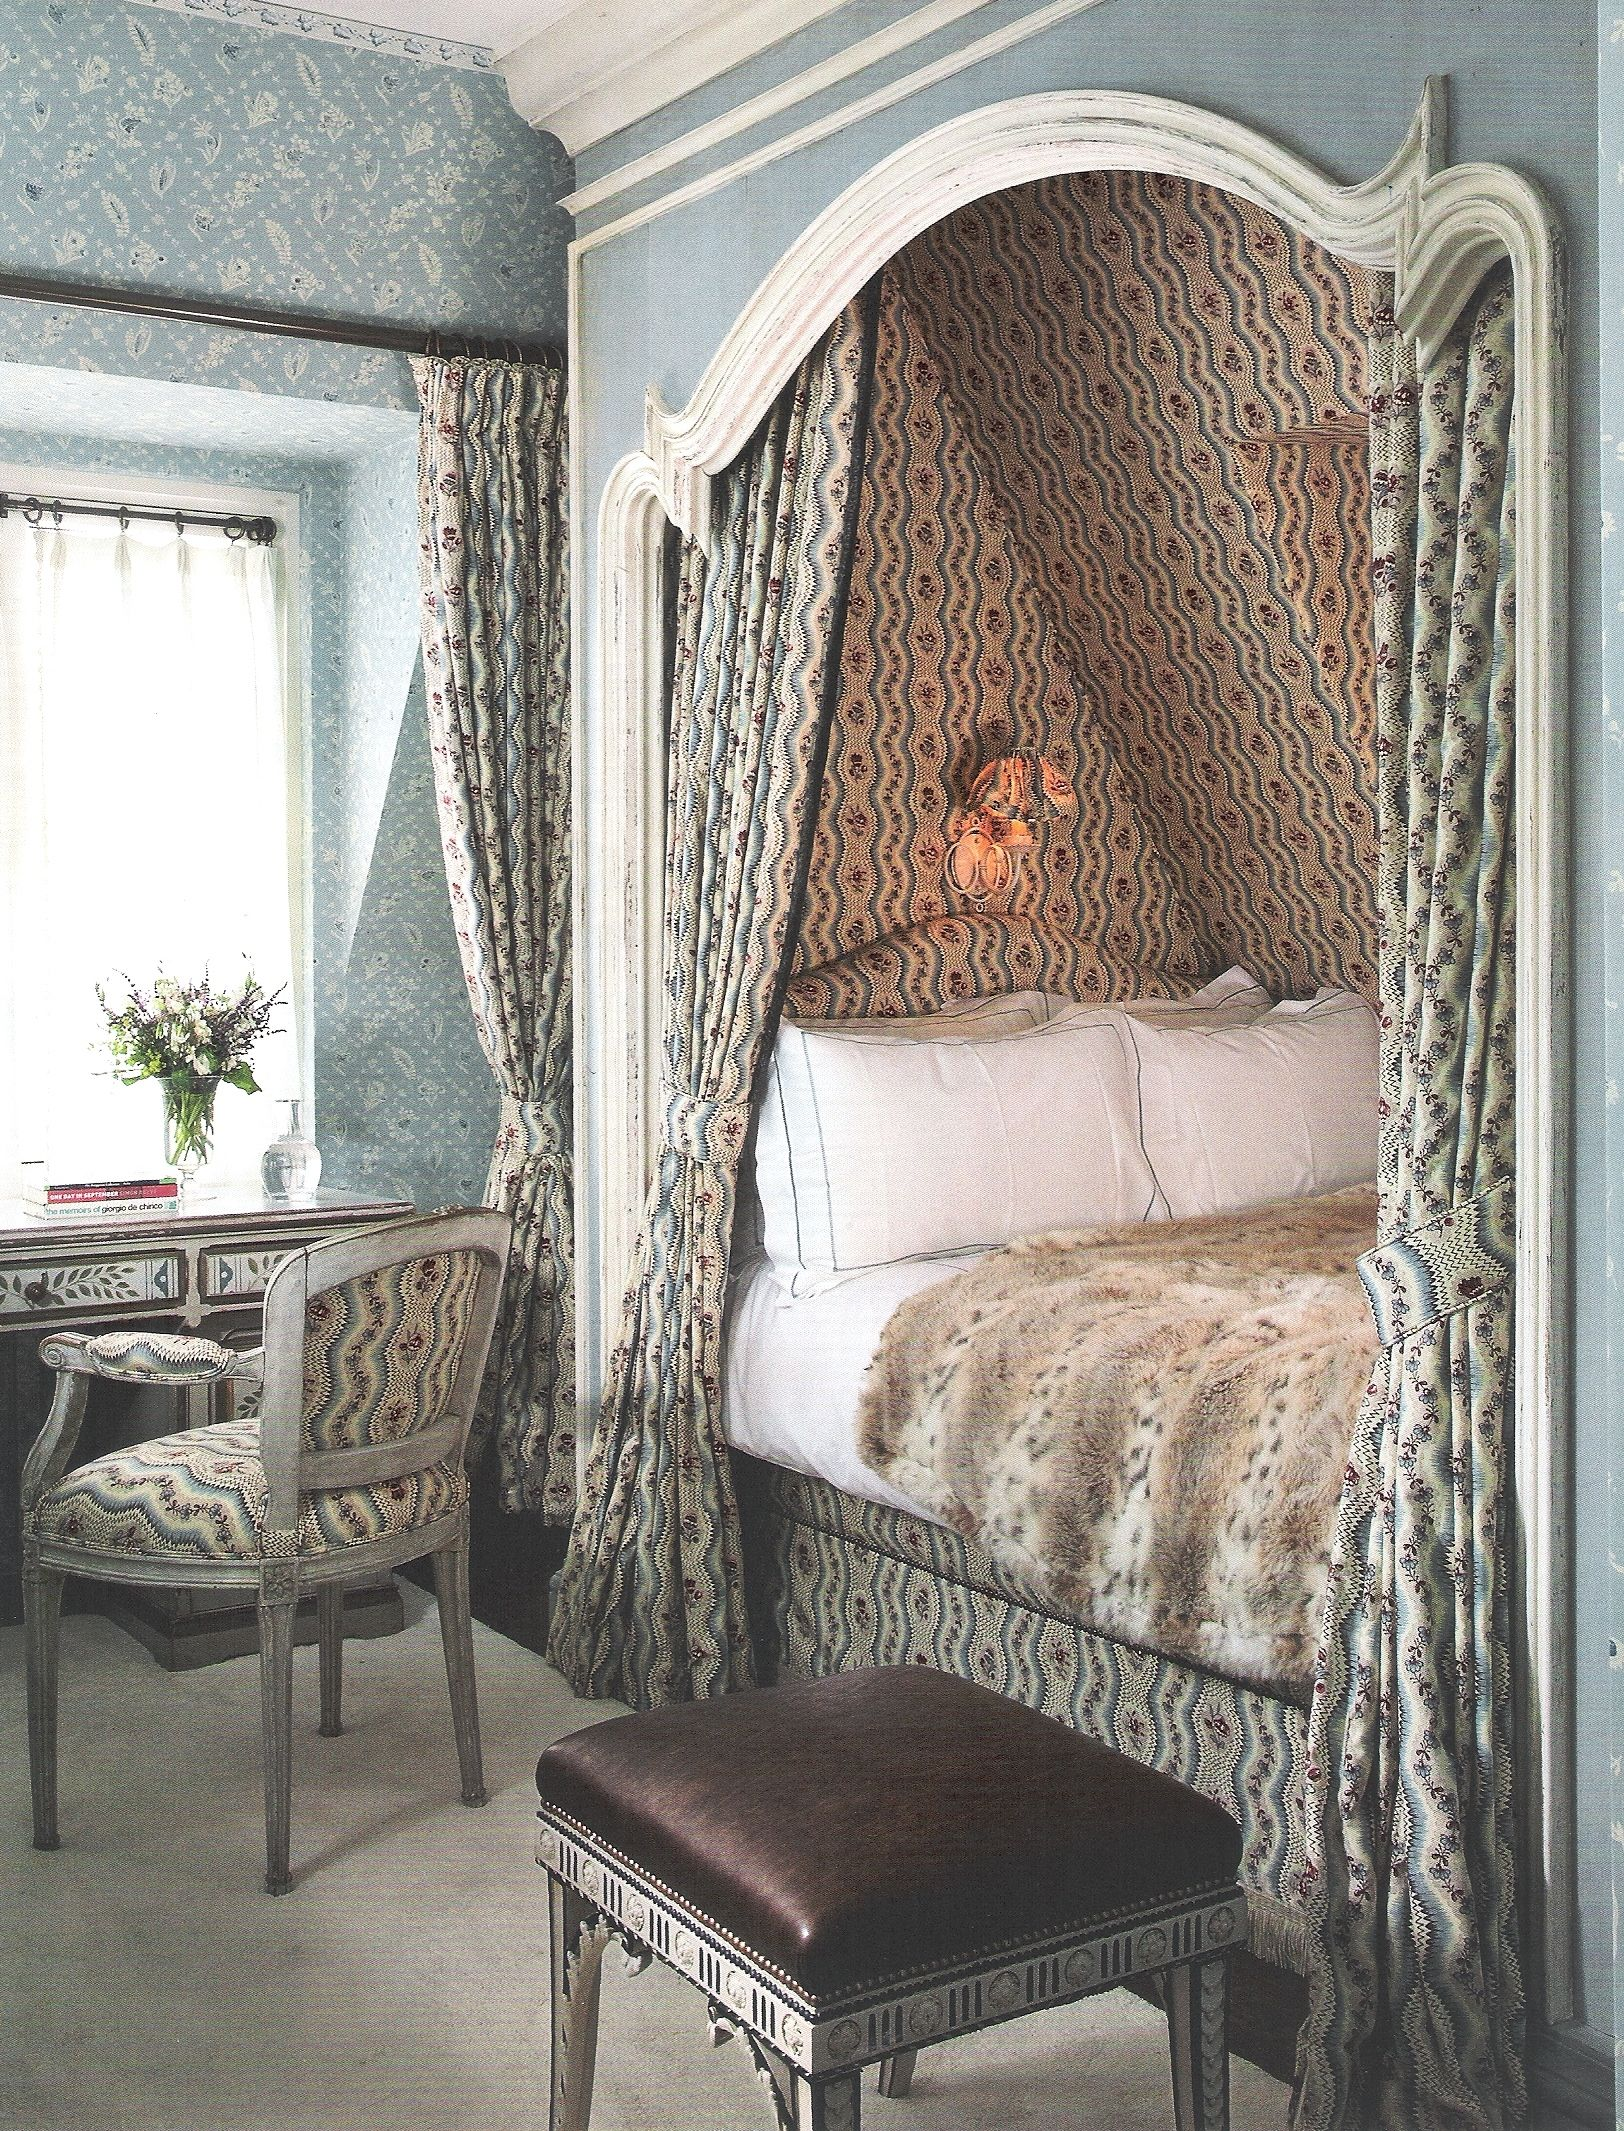 nicky haslam interior design image ad mit bildern